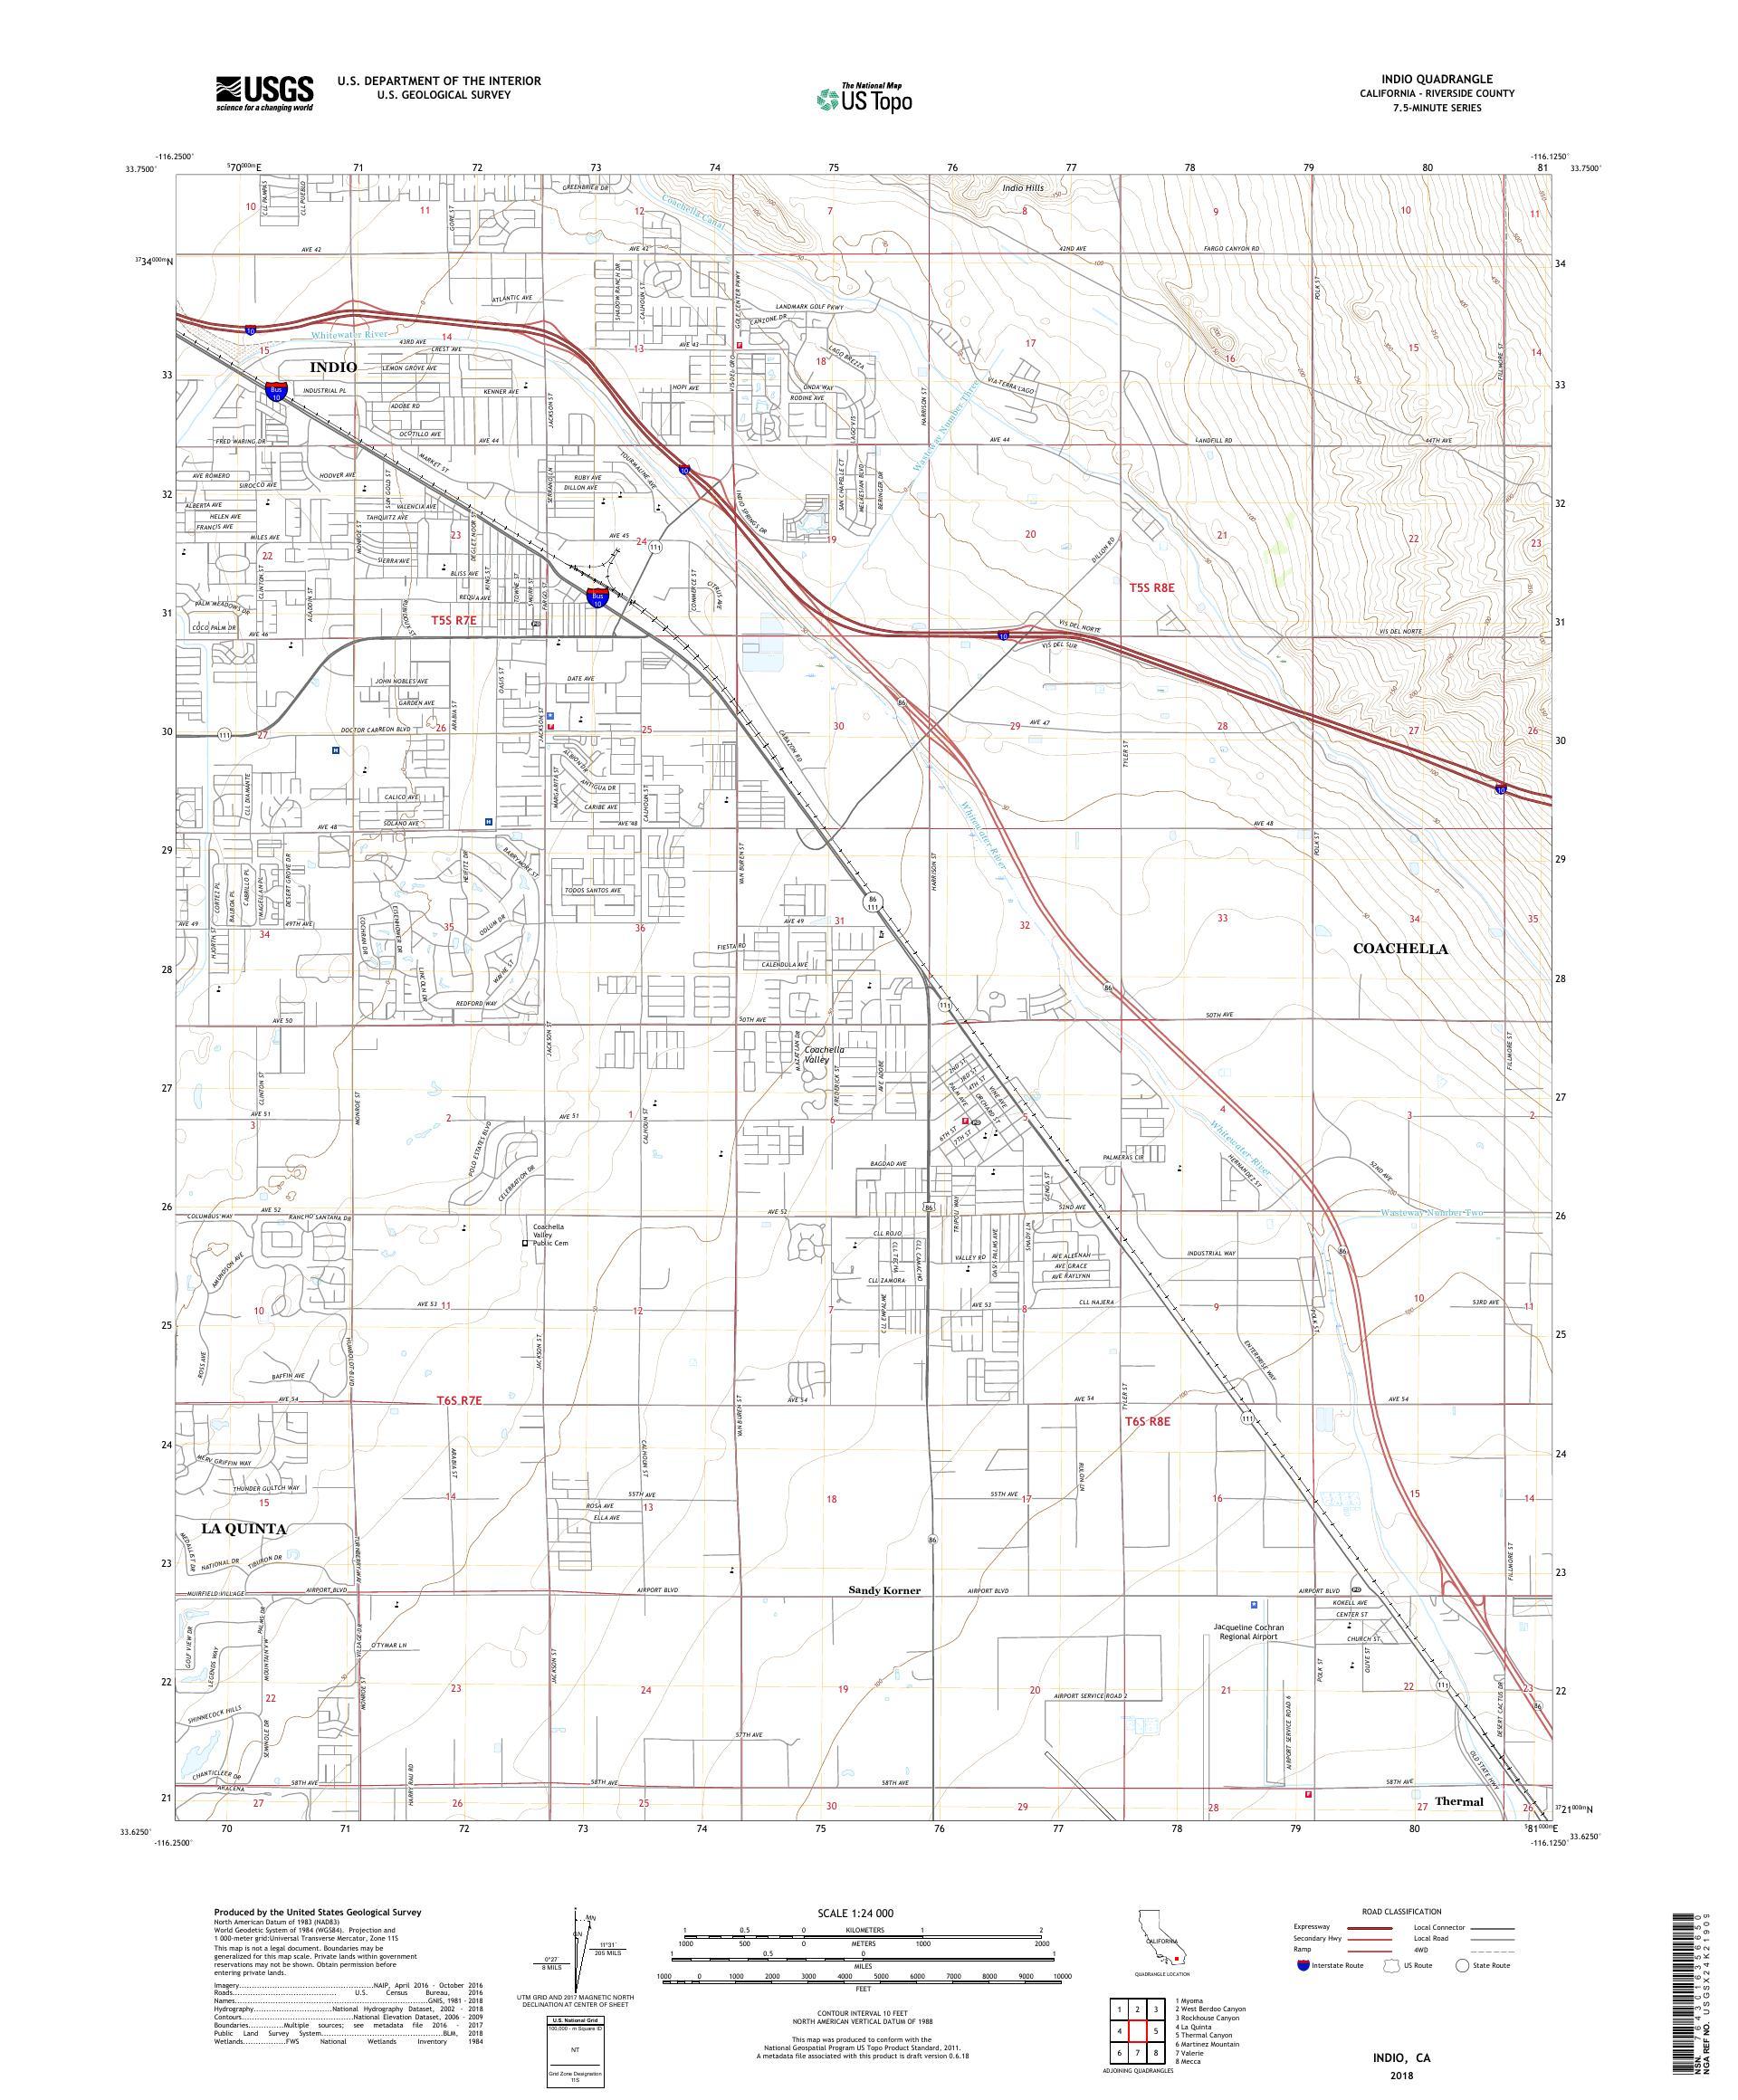 MyTopo Indio, California USGS Quad Topo Map